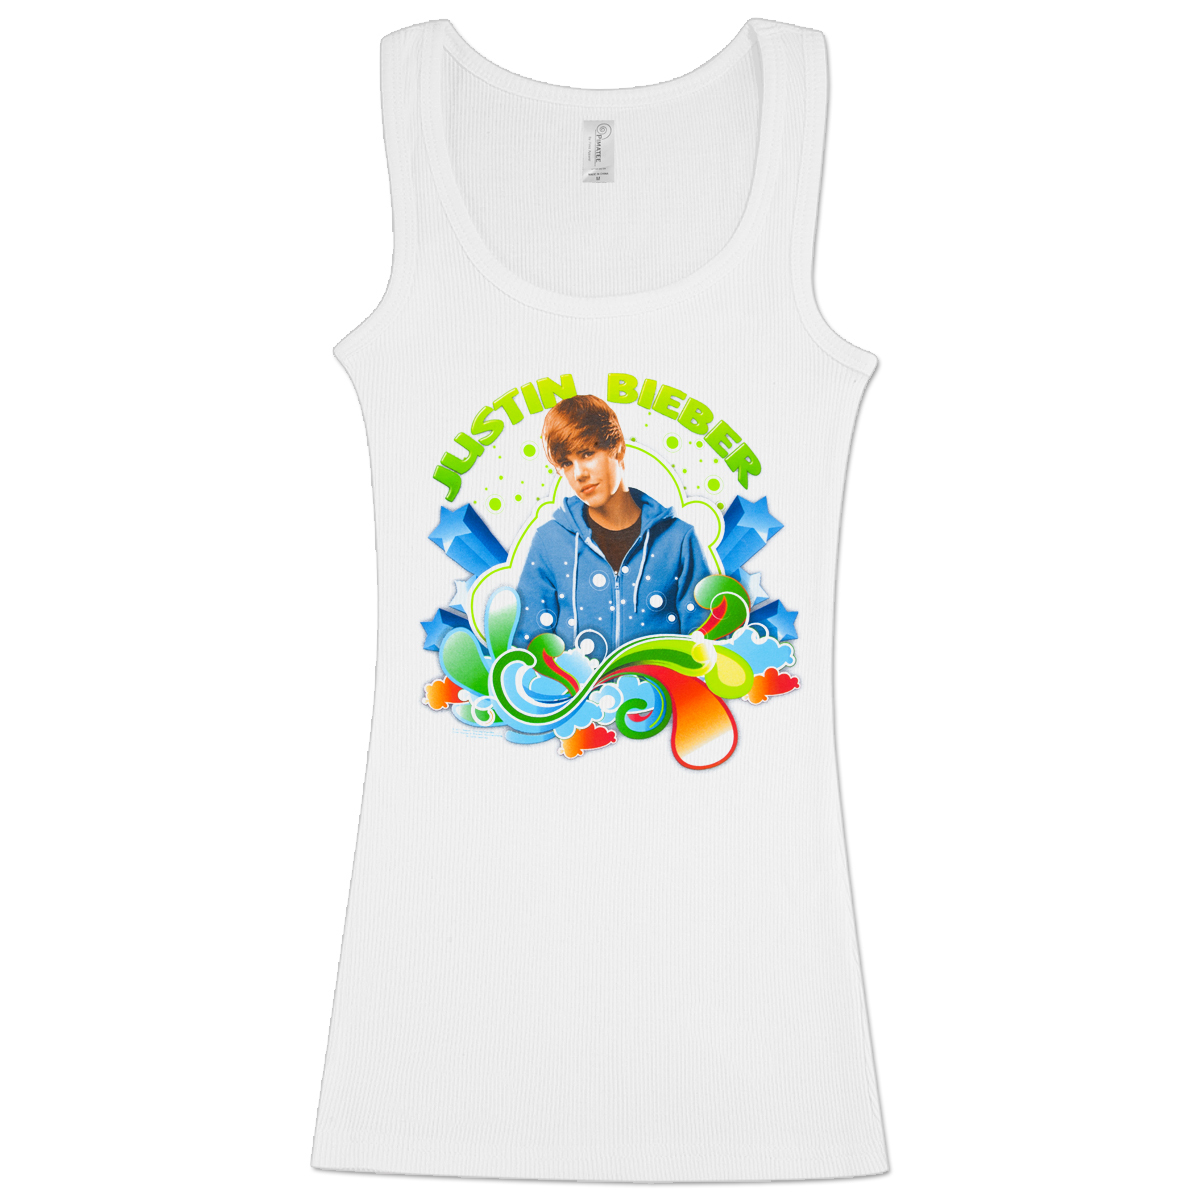 Justin Bieber Swirls & Stars Girlie Tank Top